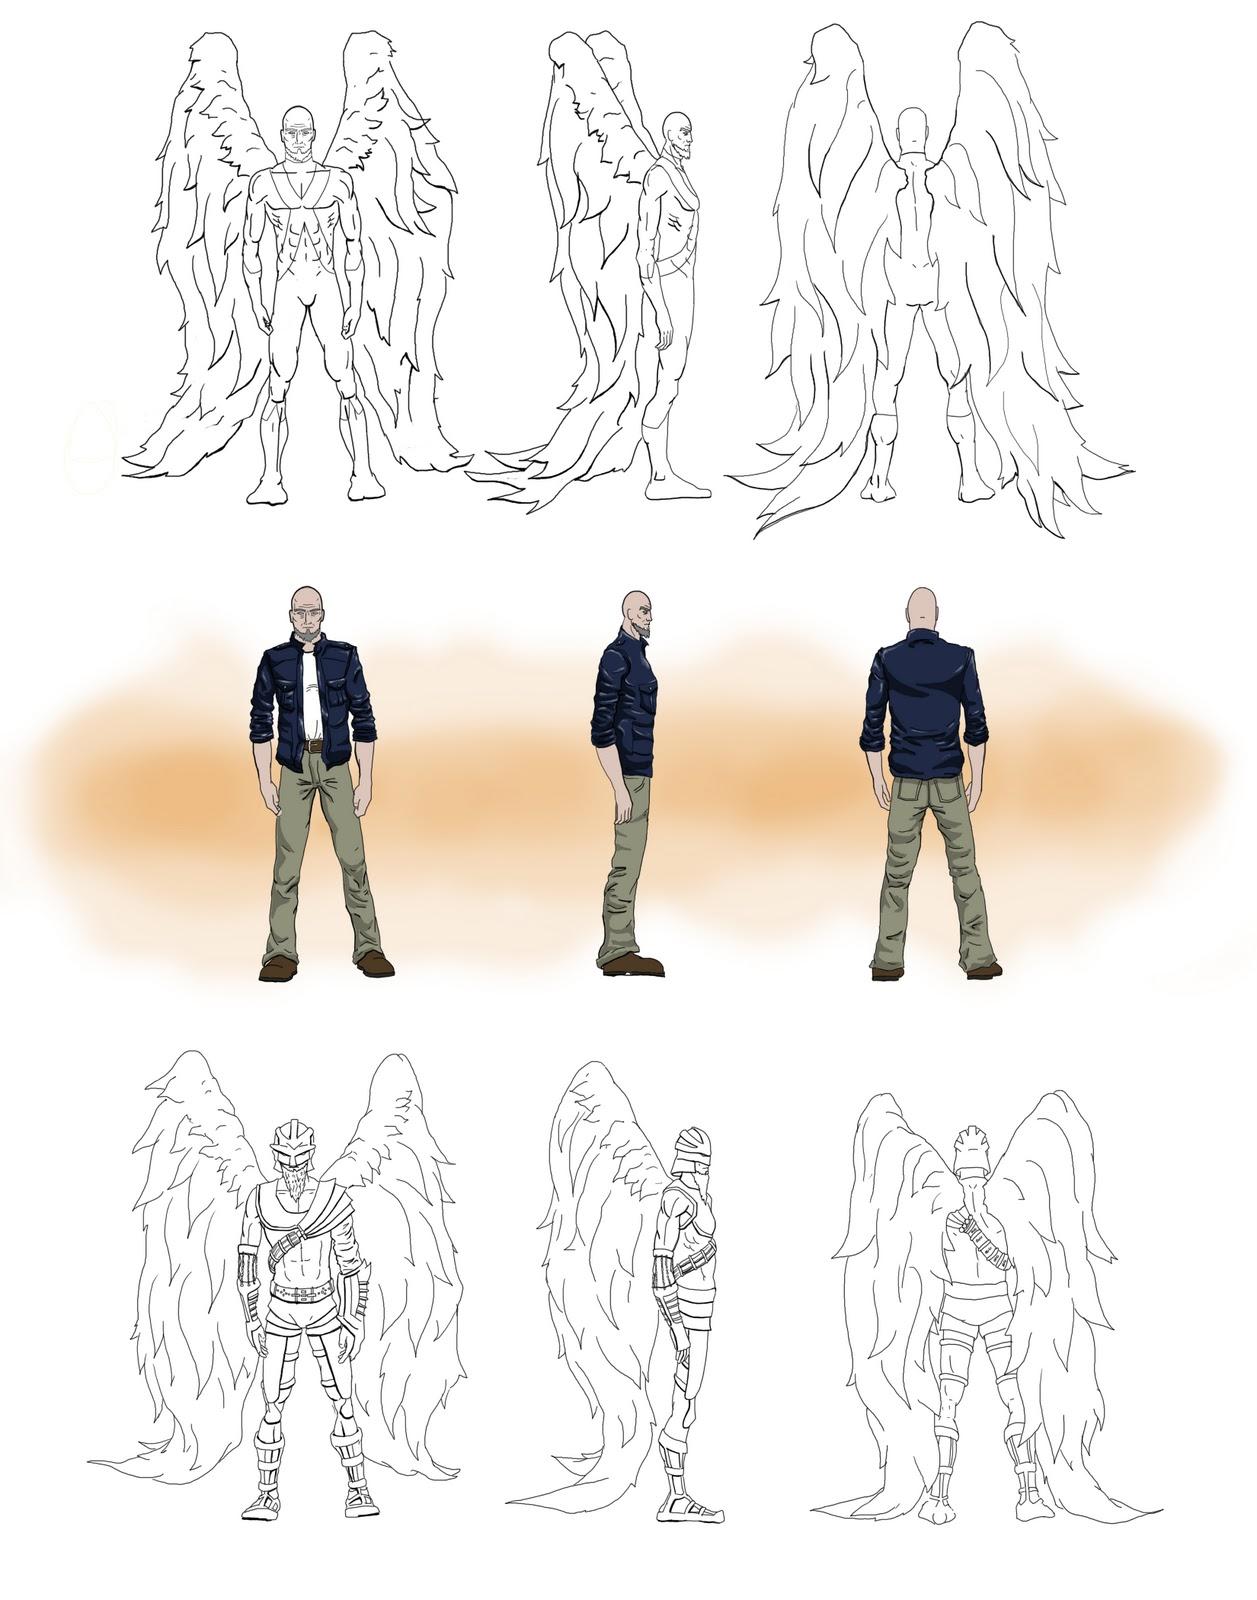 Images of Superhero Character Sheet - #rock-cafe